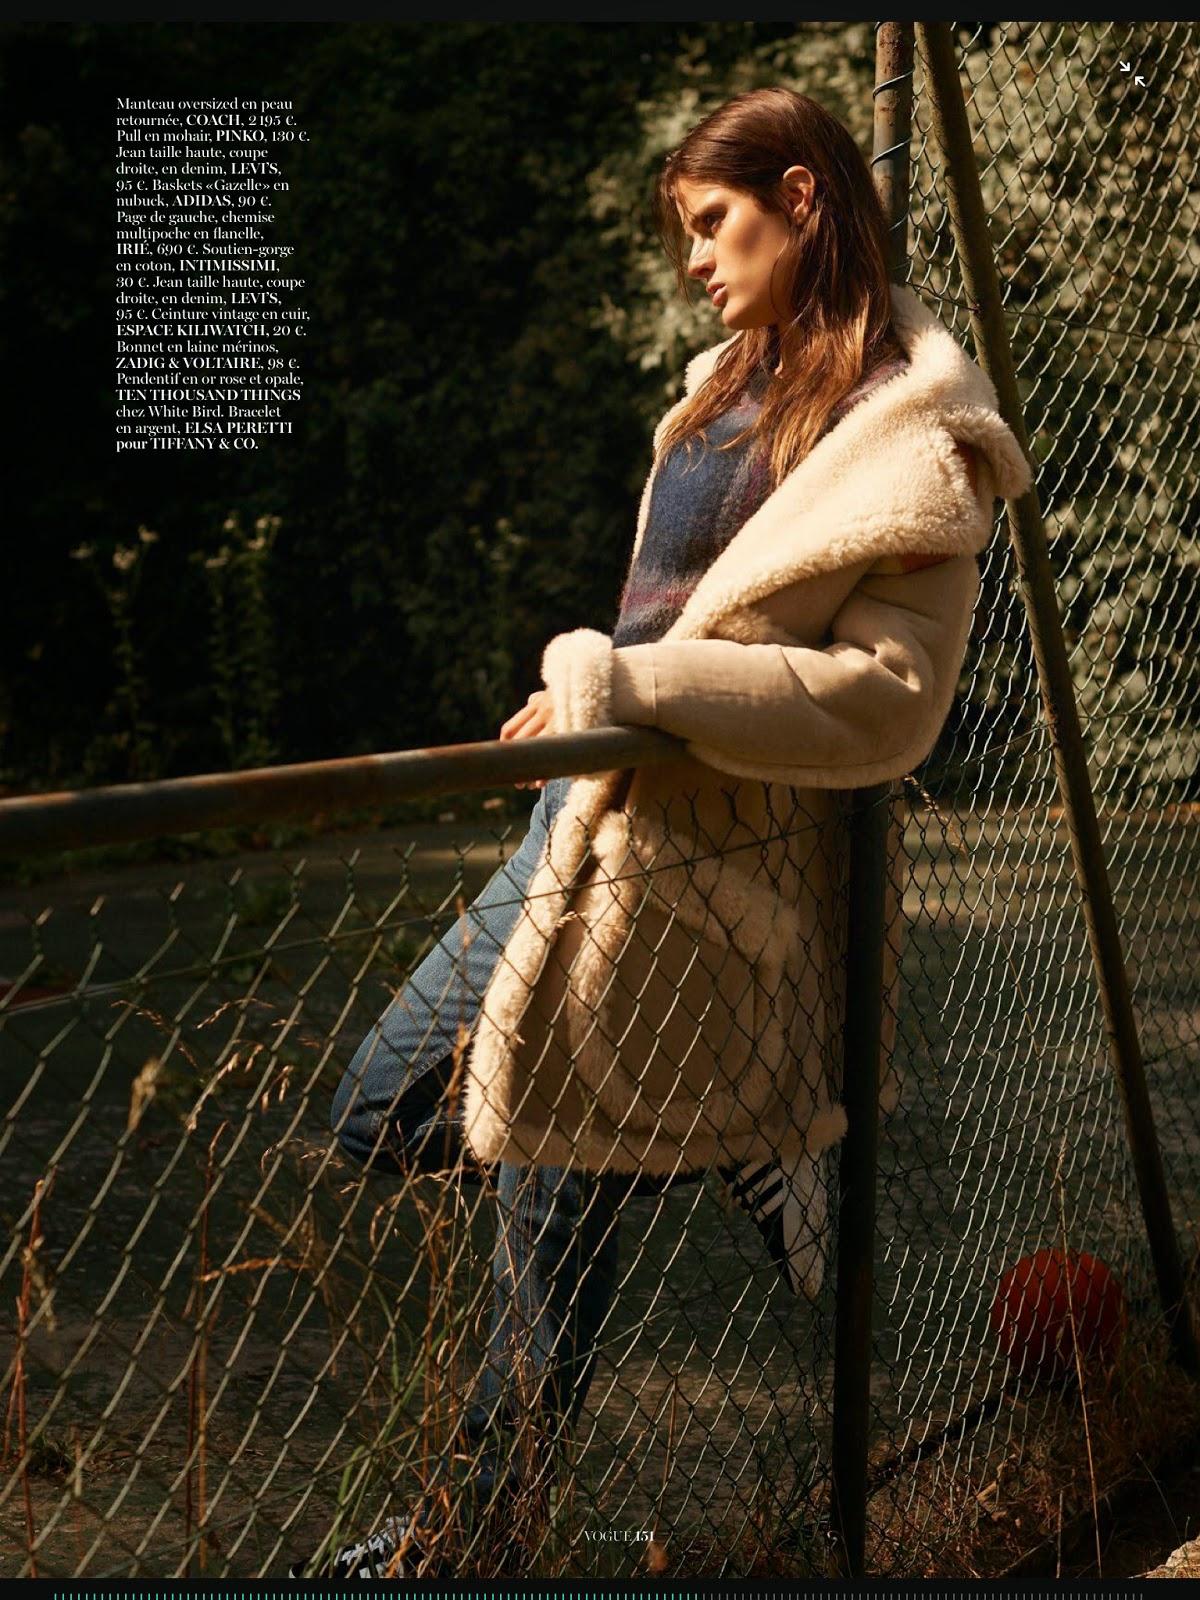 Clochet_Isabeli _Fontana _for _Vogue _Paris _November _2014_photography_by_Scott_Trindle_styling_Geraldine_Saglio_05